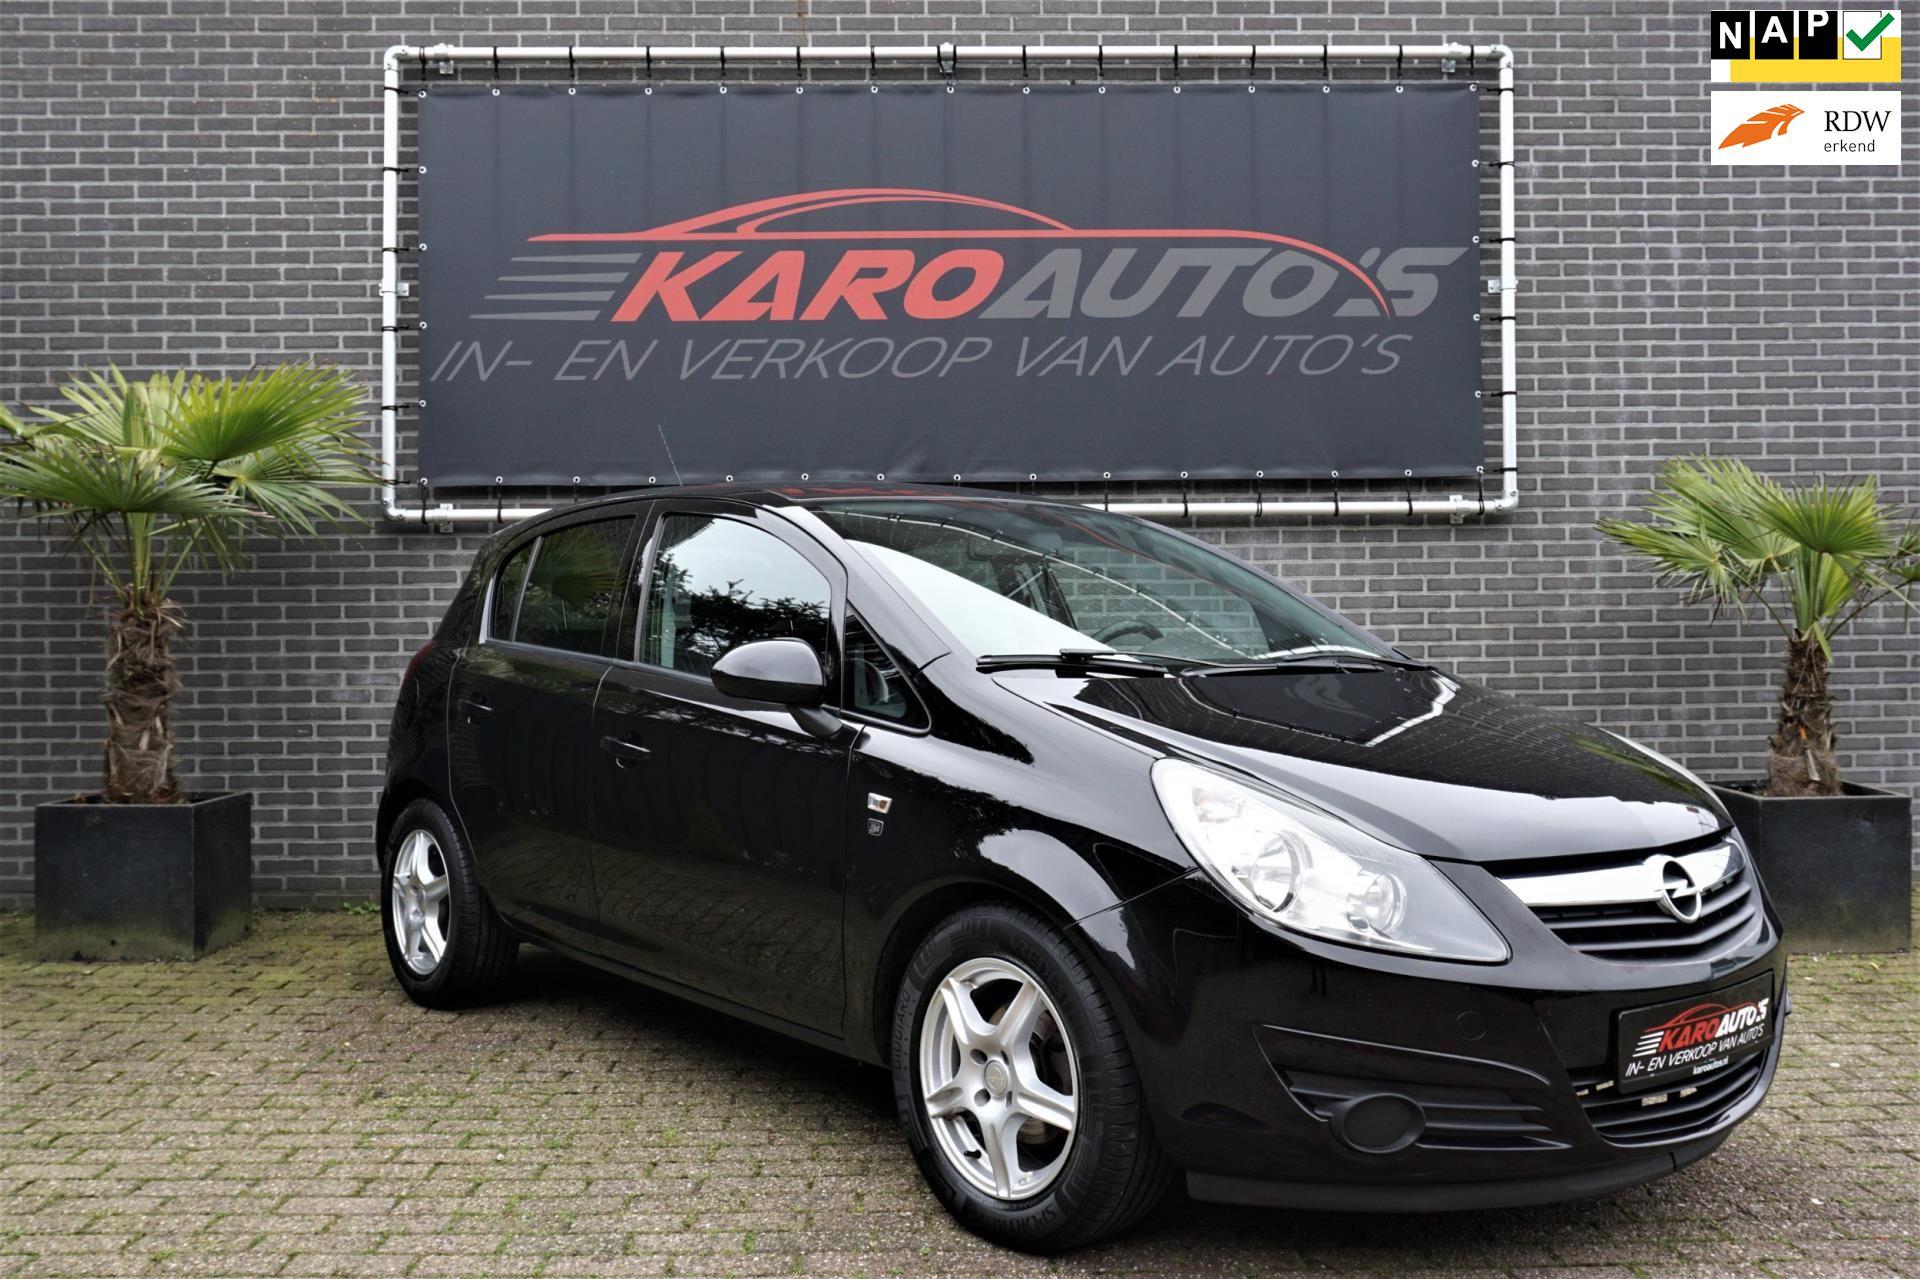 Opel Corsa occasion - KARO Auto's